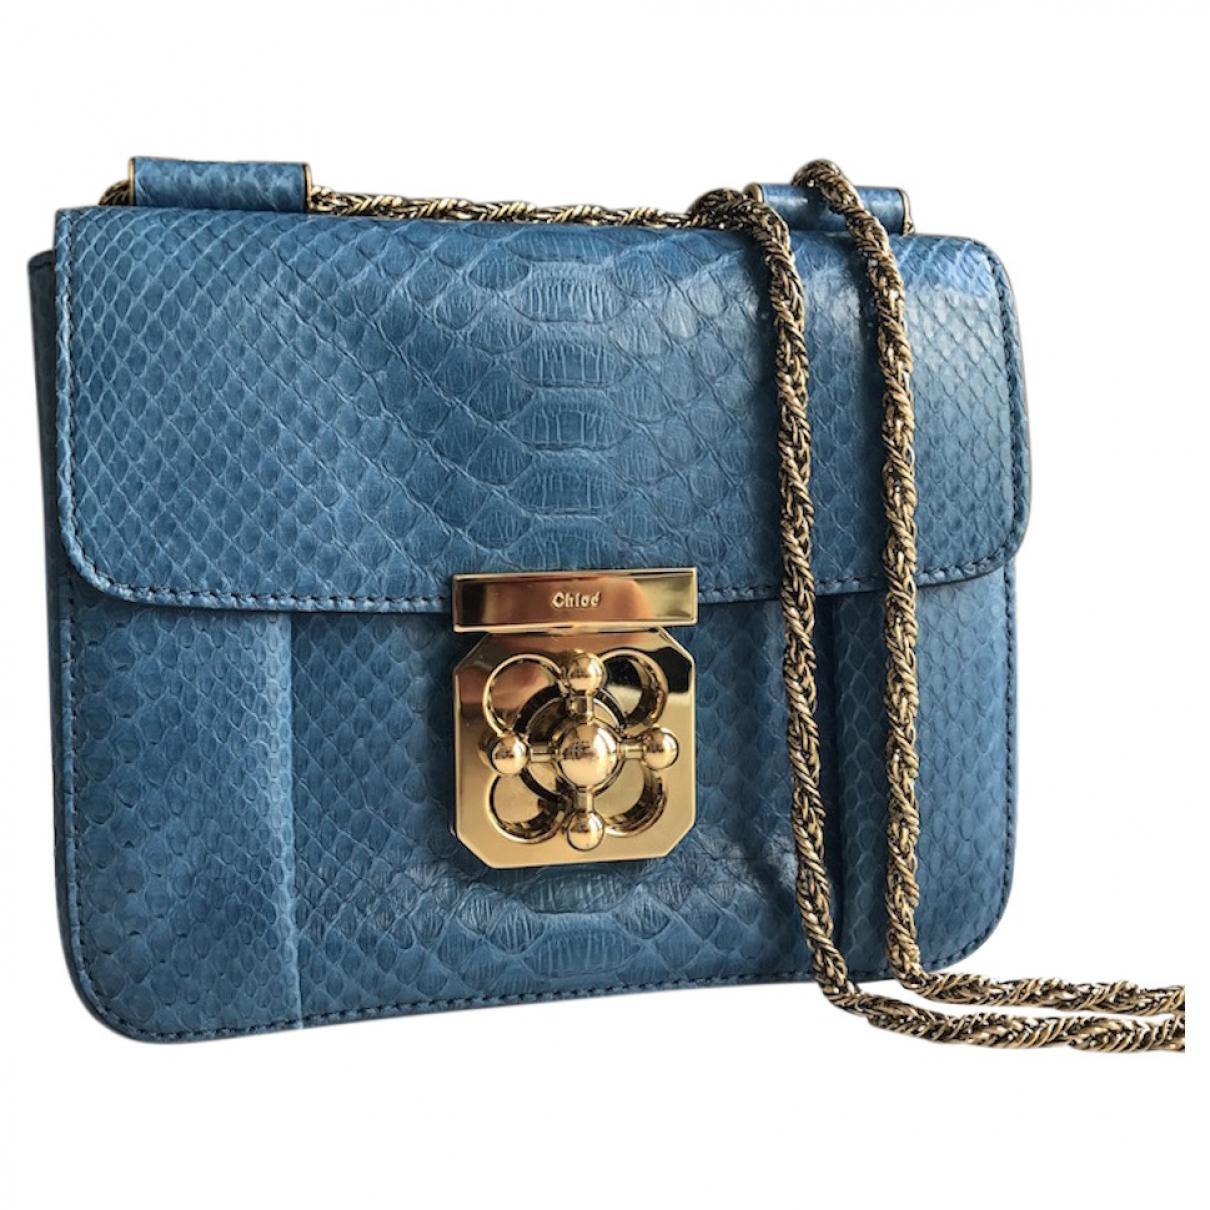 349e0a72a067 Chloé Pre-owned Elsie Python Crossbody Bag in Blue - Lyst